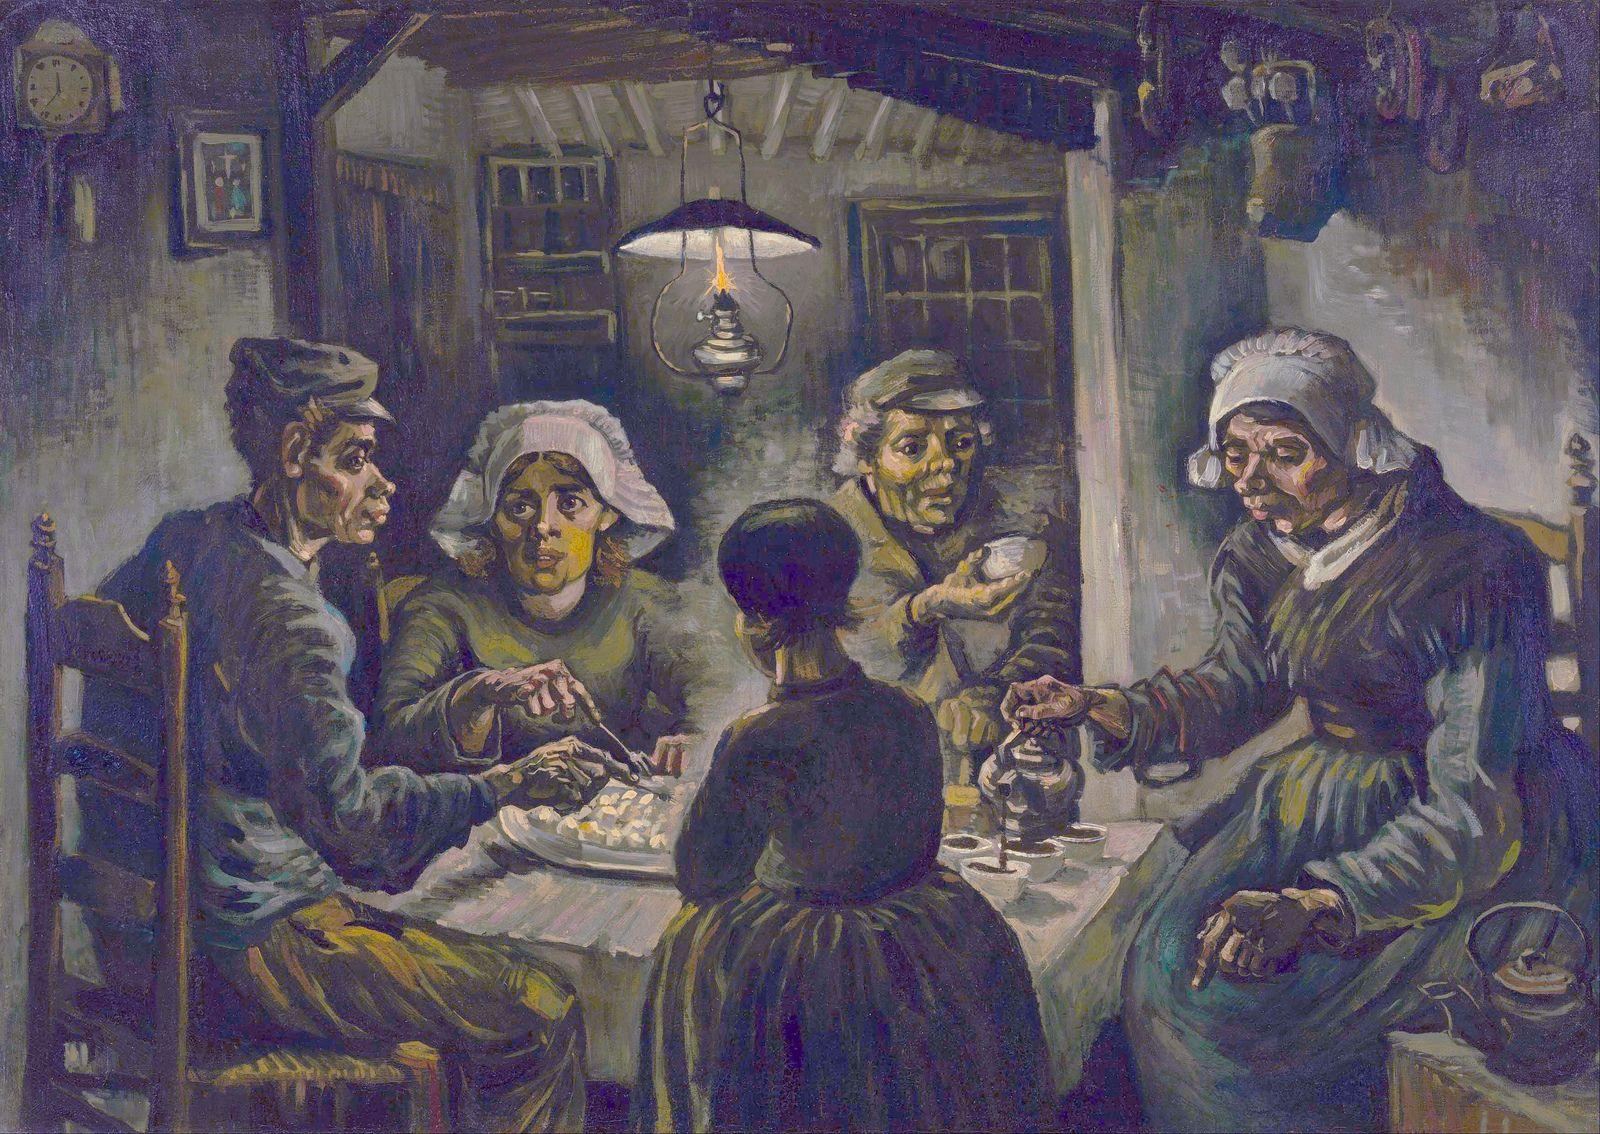 Van Gogh The Potato Eaters 1885 Van Gogh Pinturas Os